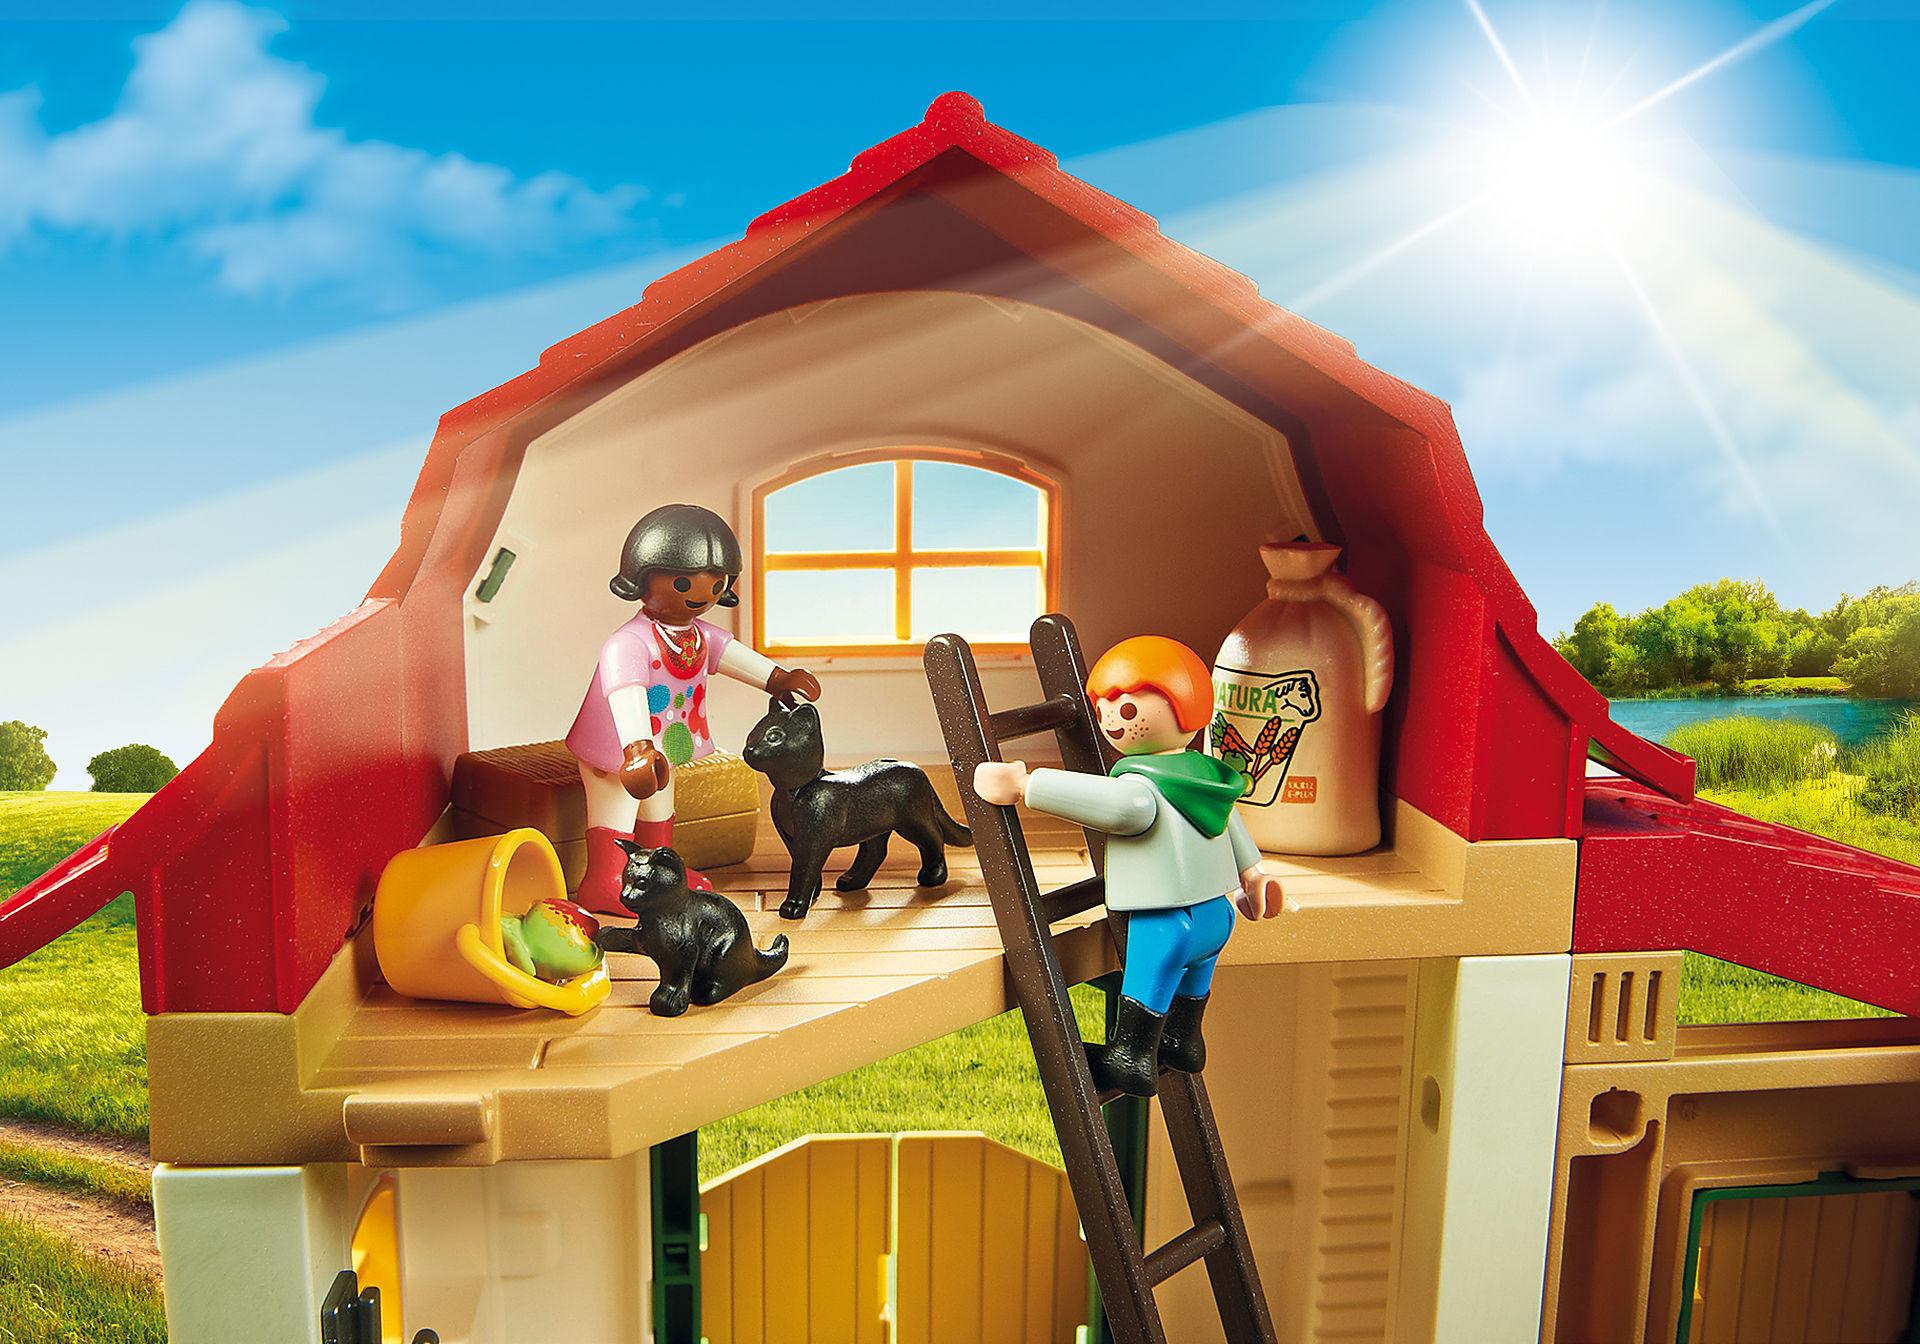 http://media.playmobil.com/i/playmobil/6927_product_extra1/Ponyhof